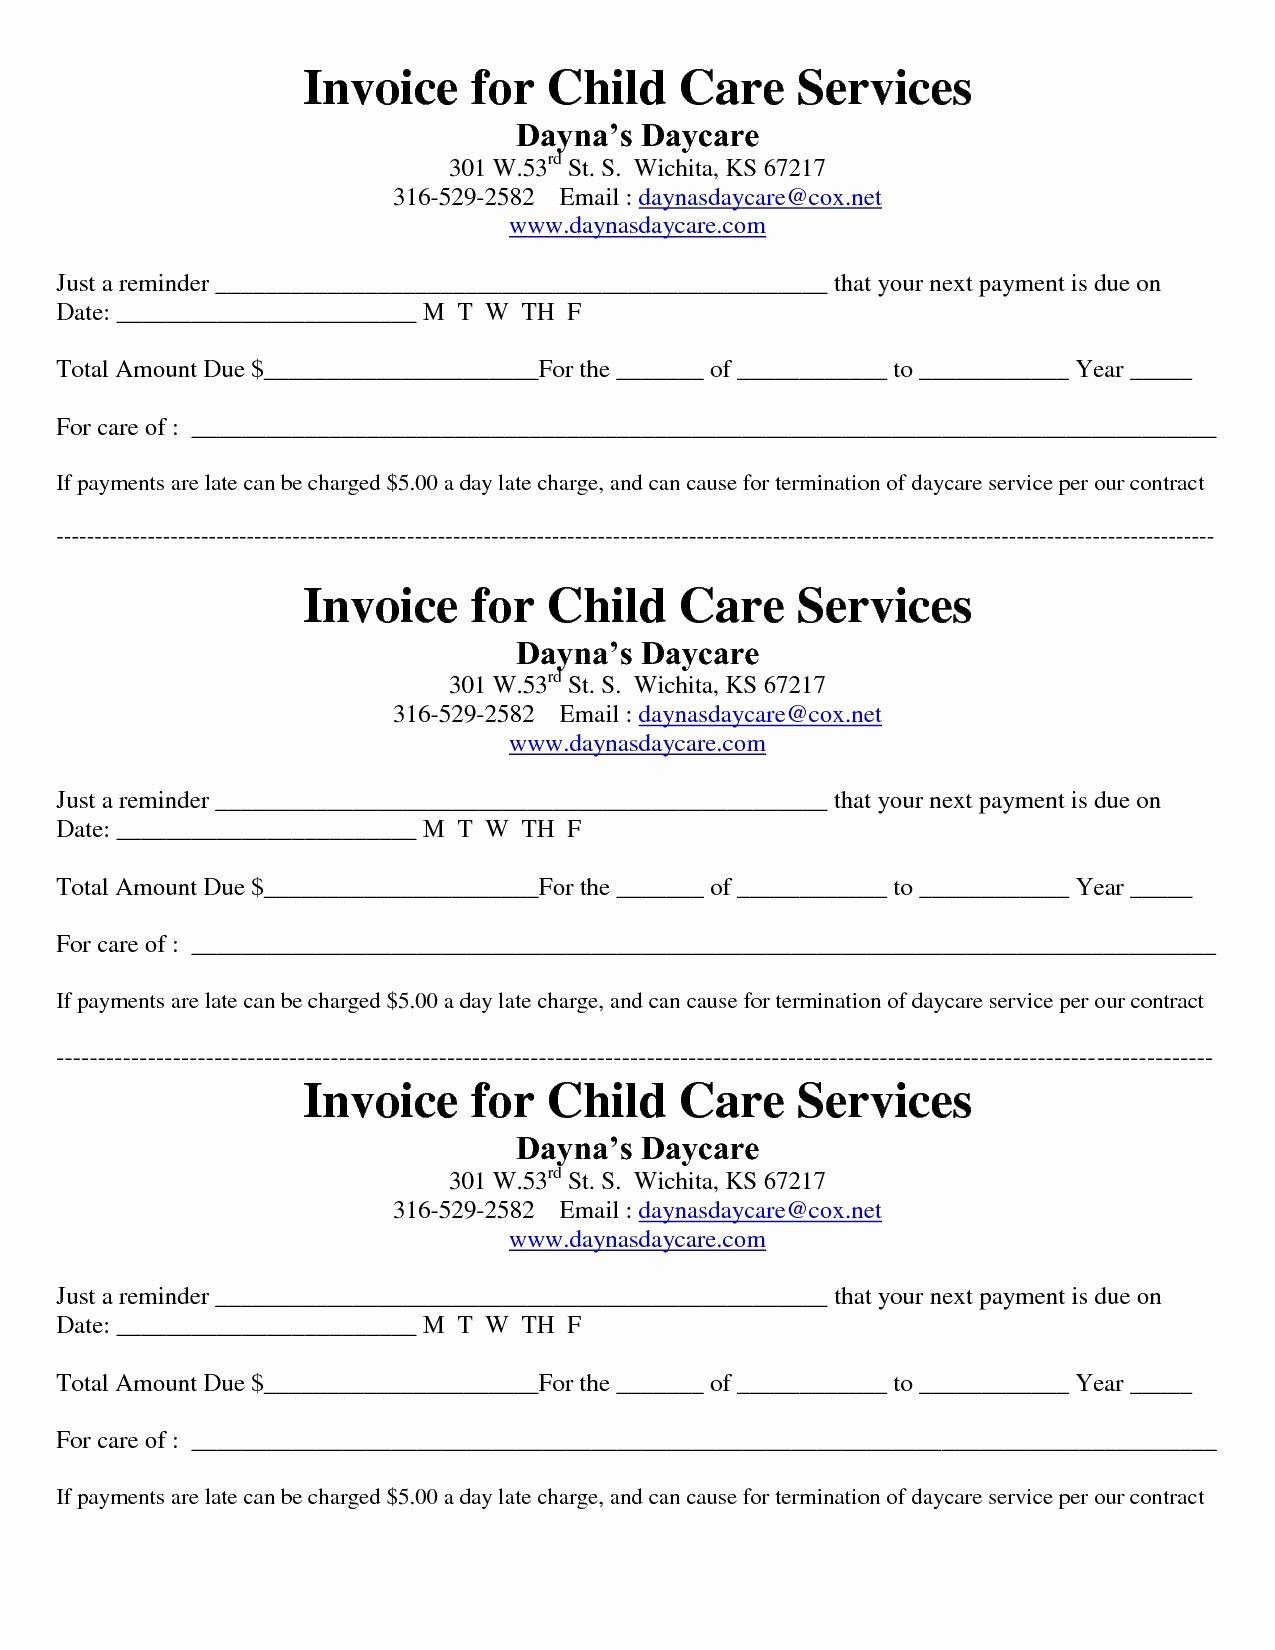 Invoice and Receipt Template Unique Child Care Receipt Invoice Jordi Preschool